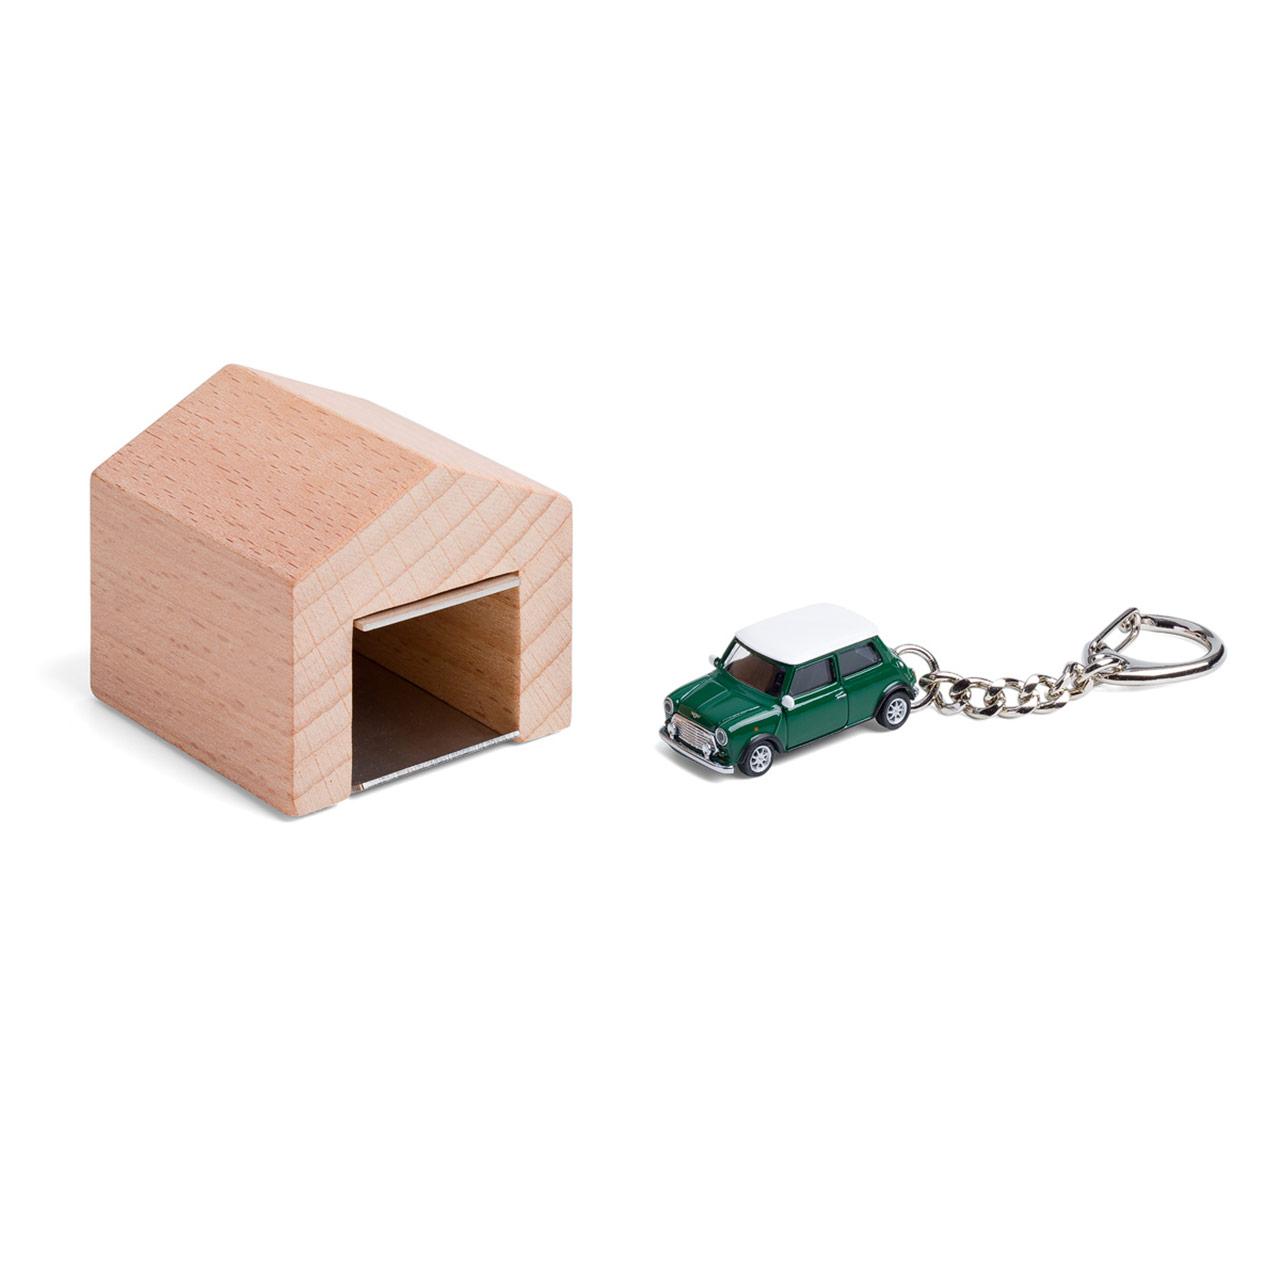 British Racing Green Mini Cooper keyring with beech wood garage | the design gift shop